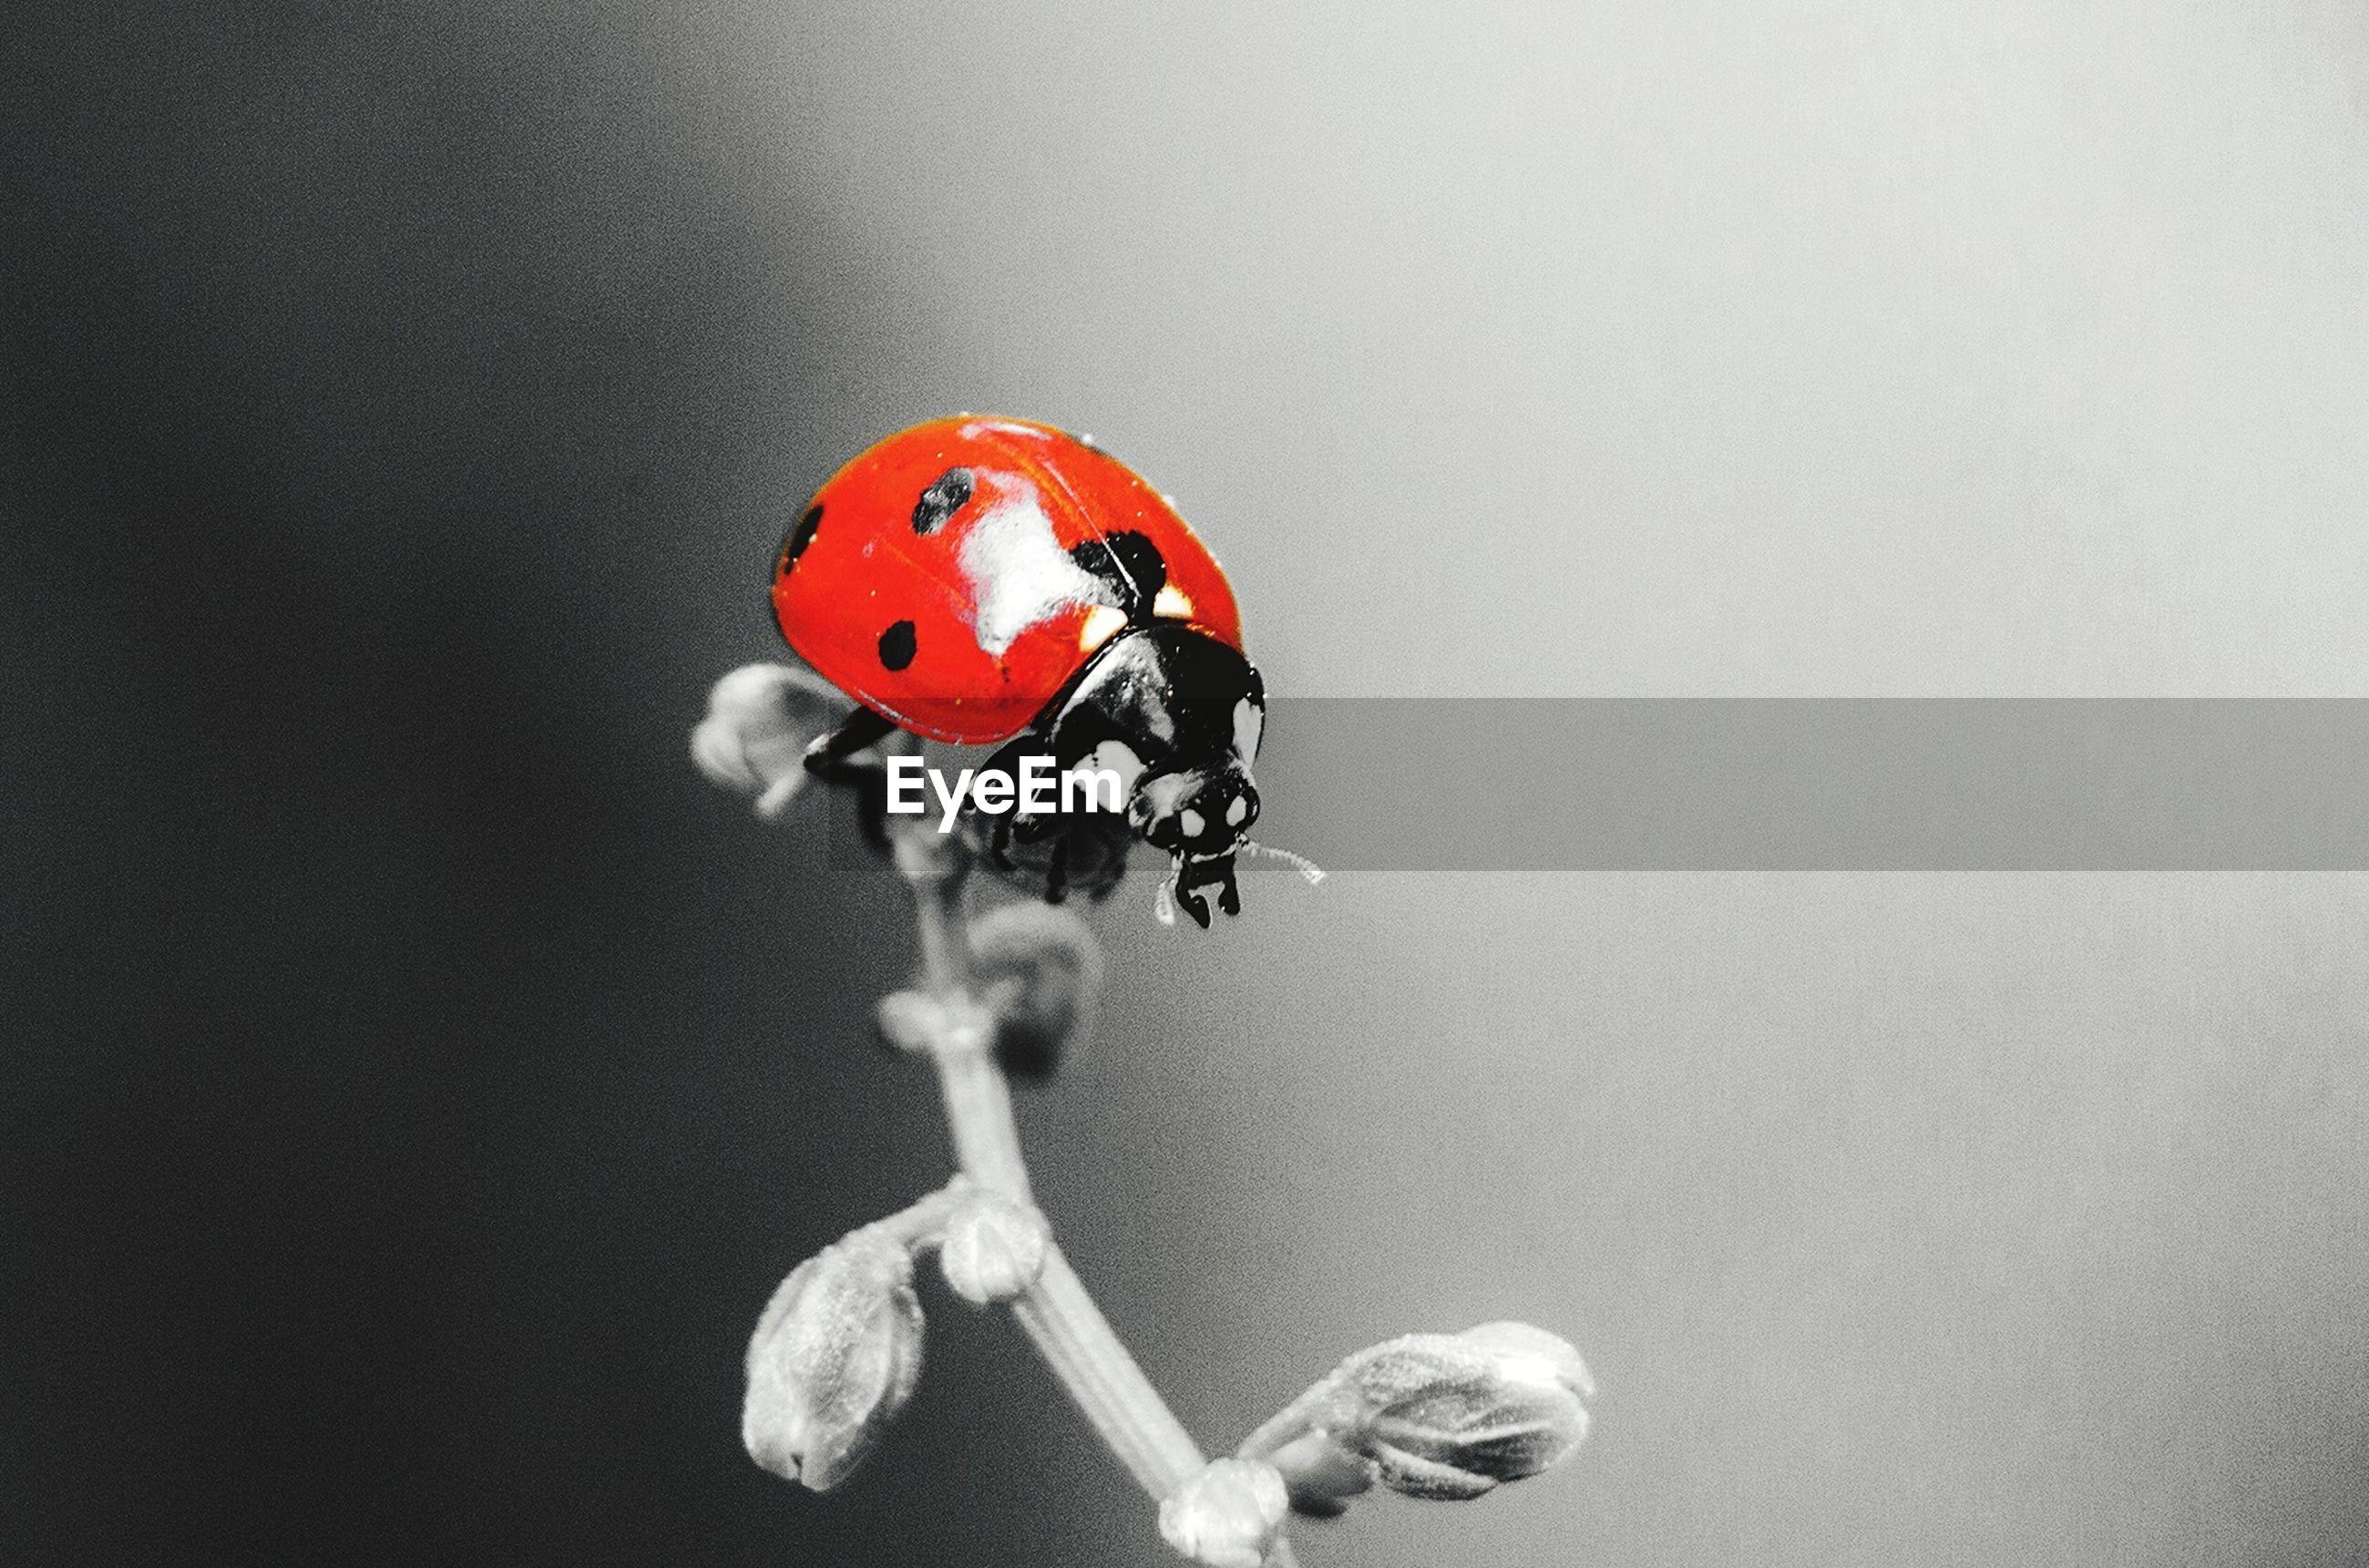 ladybug, close-up, studio shot, beetle, no people, indoors, copy space, focus on foreground, insect, nature, orange color, invertebrate, still life, day, animal wildlife, single object, representation